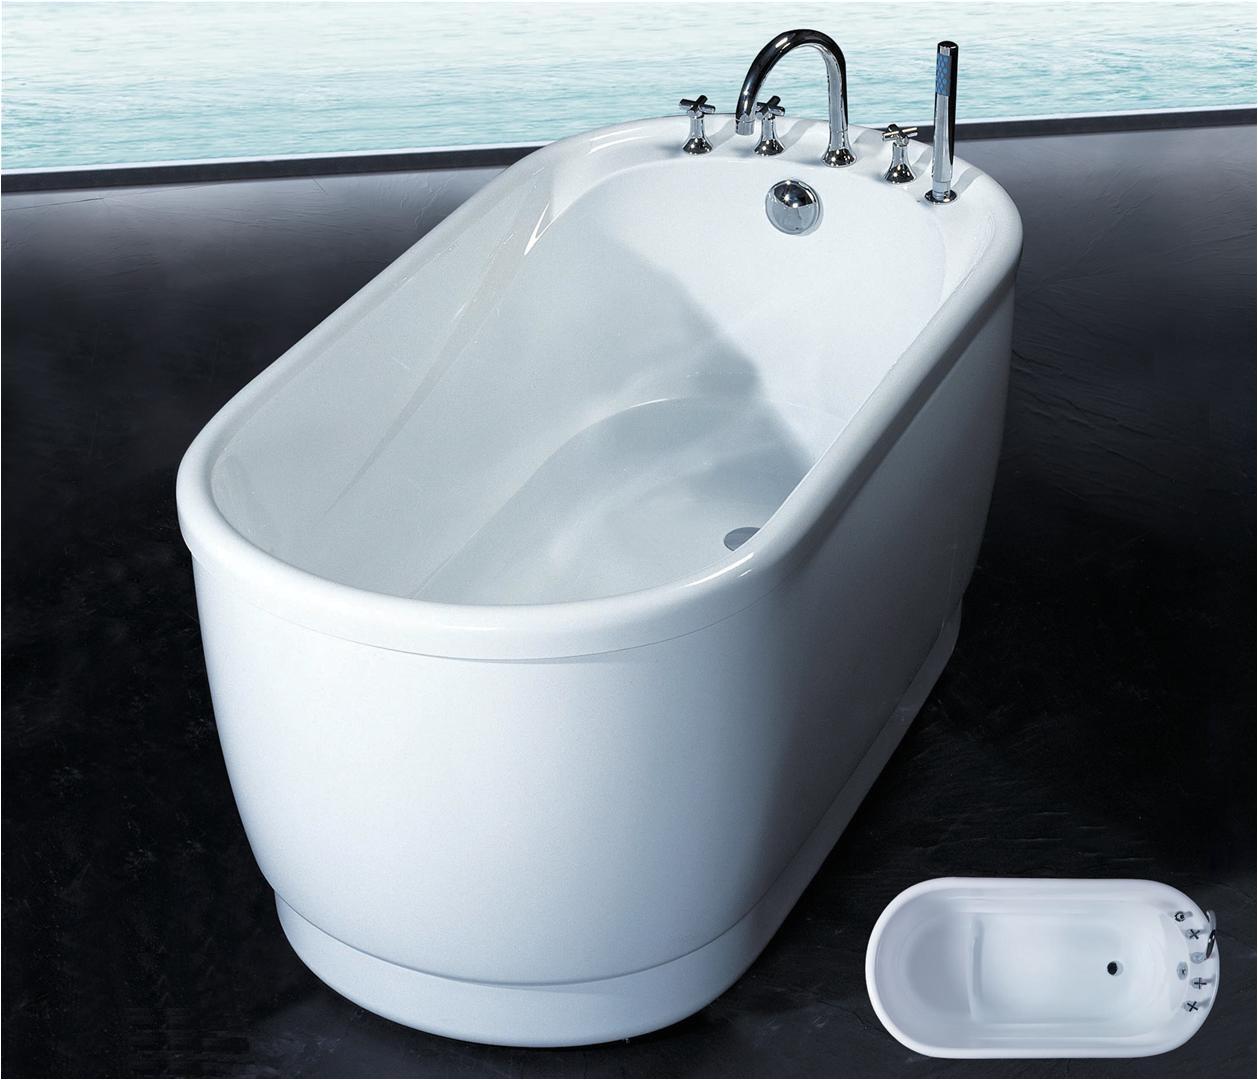 Freestanding Bathtub 1300mm Piccolo 1400mm Freestanding Acrylic Baths